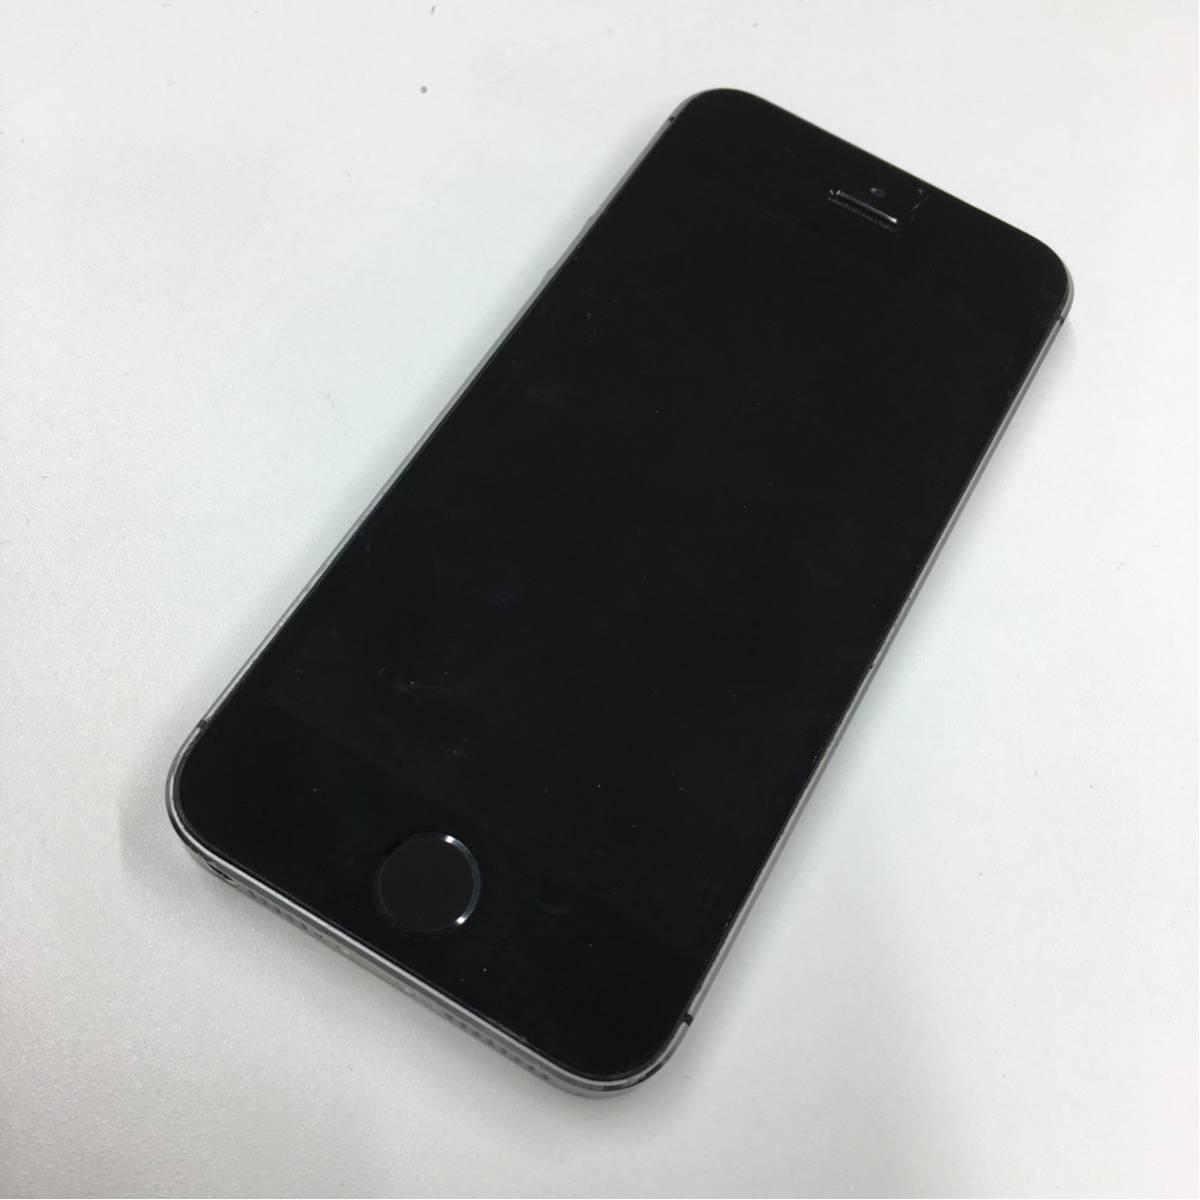 ☆docomo☆iPhone5S 16GB(グレー)☆ma14202